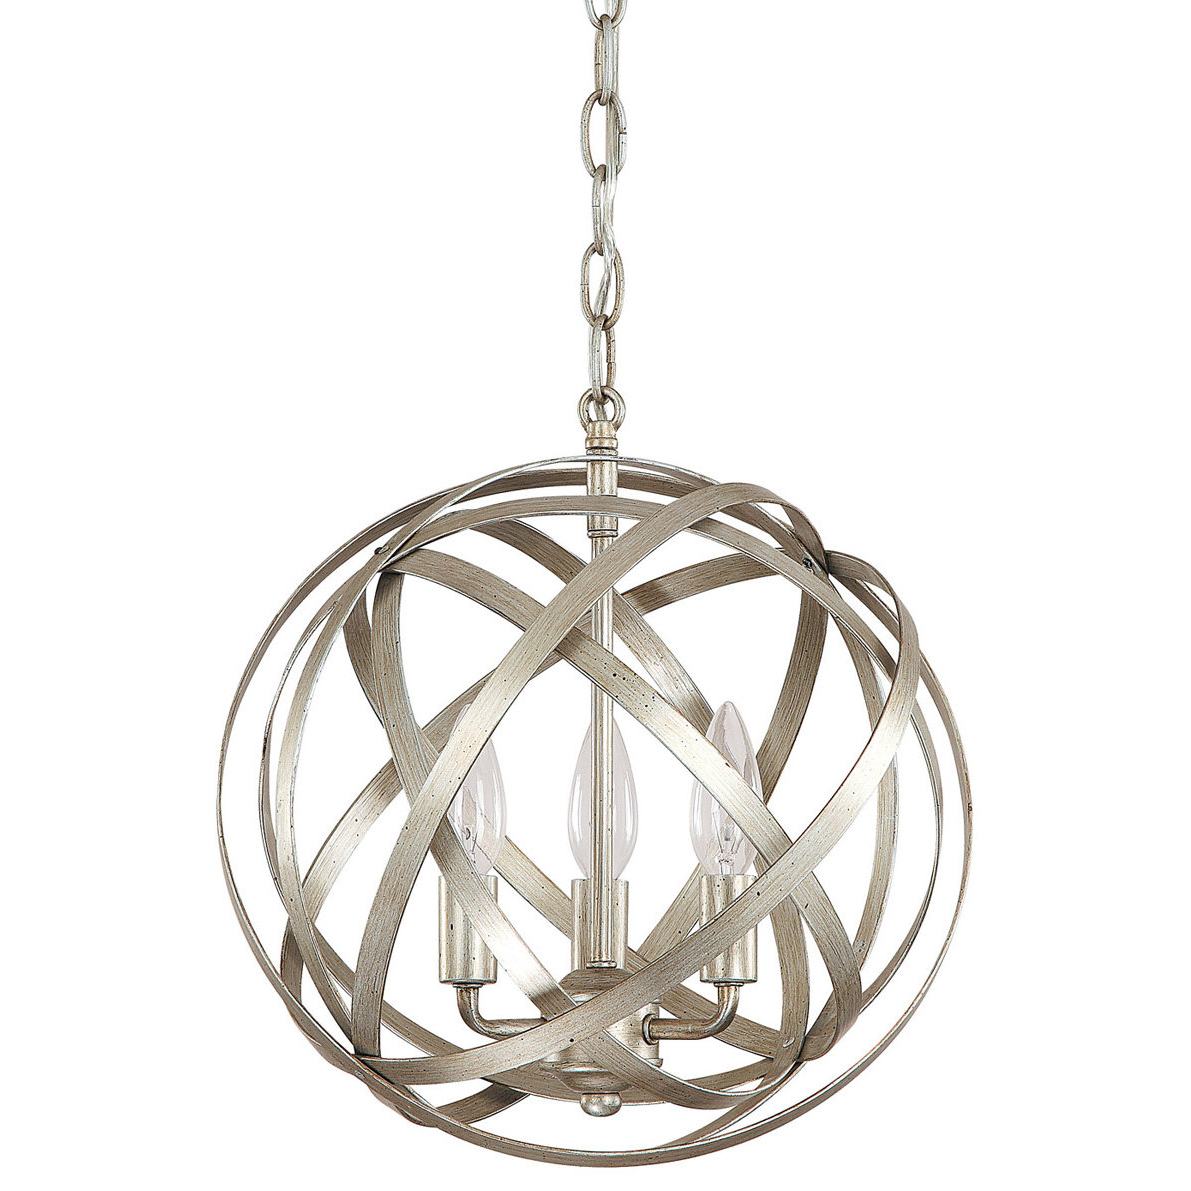 Everly Quinn Adcock 3-Light Globe Pendant with regard to Current Adcock 3-Light Single Globe Pendants